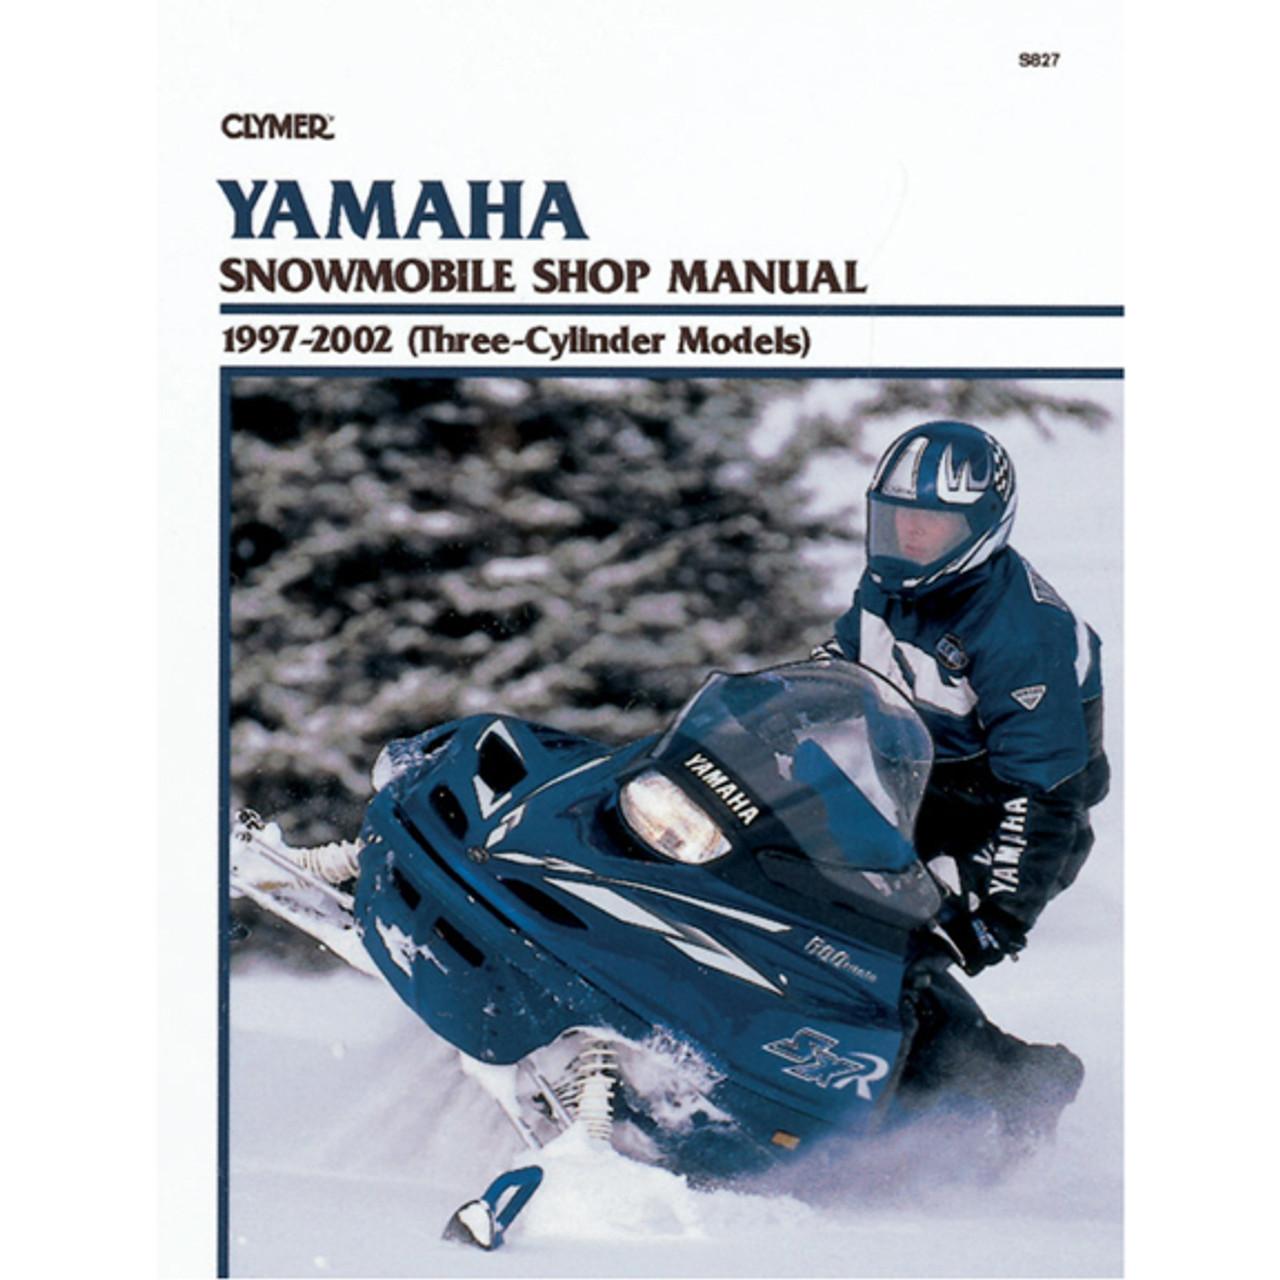 clymer s827 service shop repair manual yamaha snowmobile 97 02 rh speedaddicts com Polaris Classic 600 Snowmobile Polaris Snowmobile Parts Diagrams